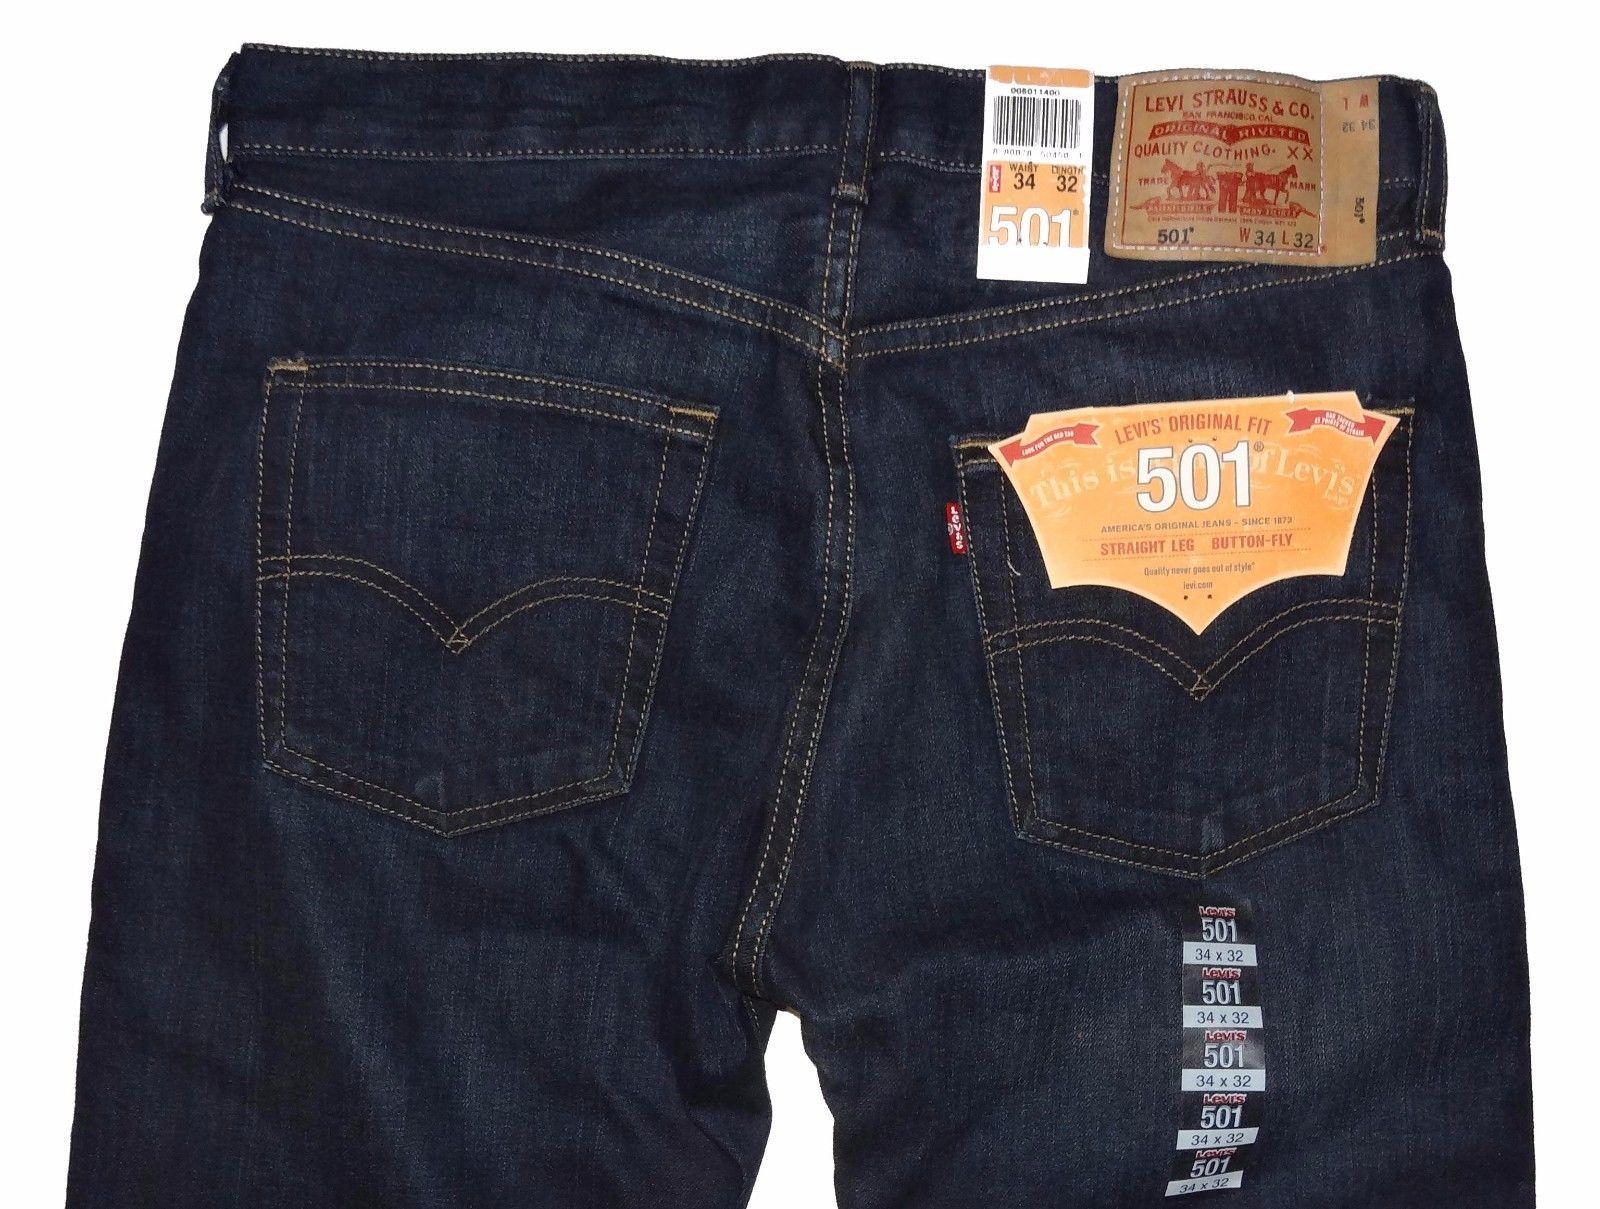 8a15245f8fd Levi's 501 Original Fit Straight Leg Men's Jeans 34 x 32 New #1400 Rare  Color - $76.44